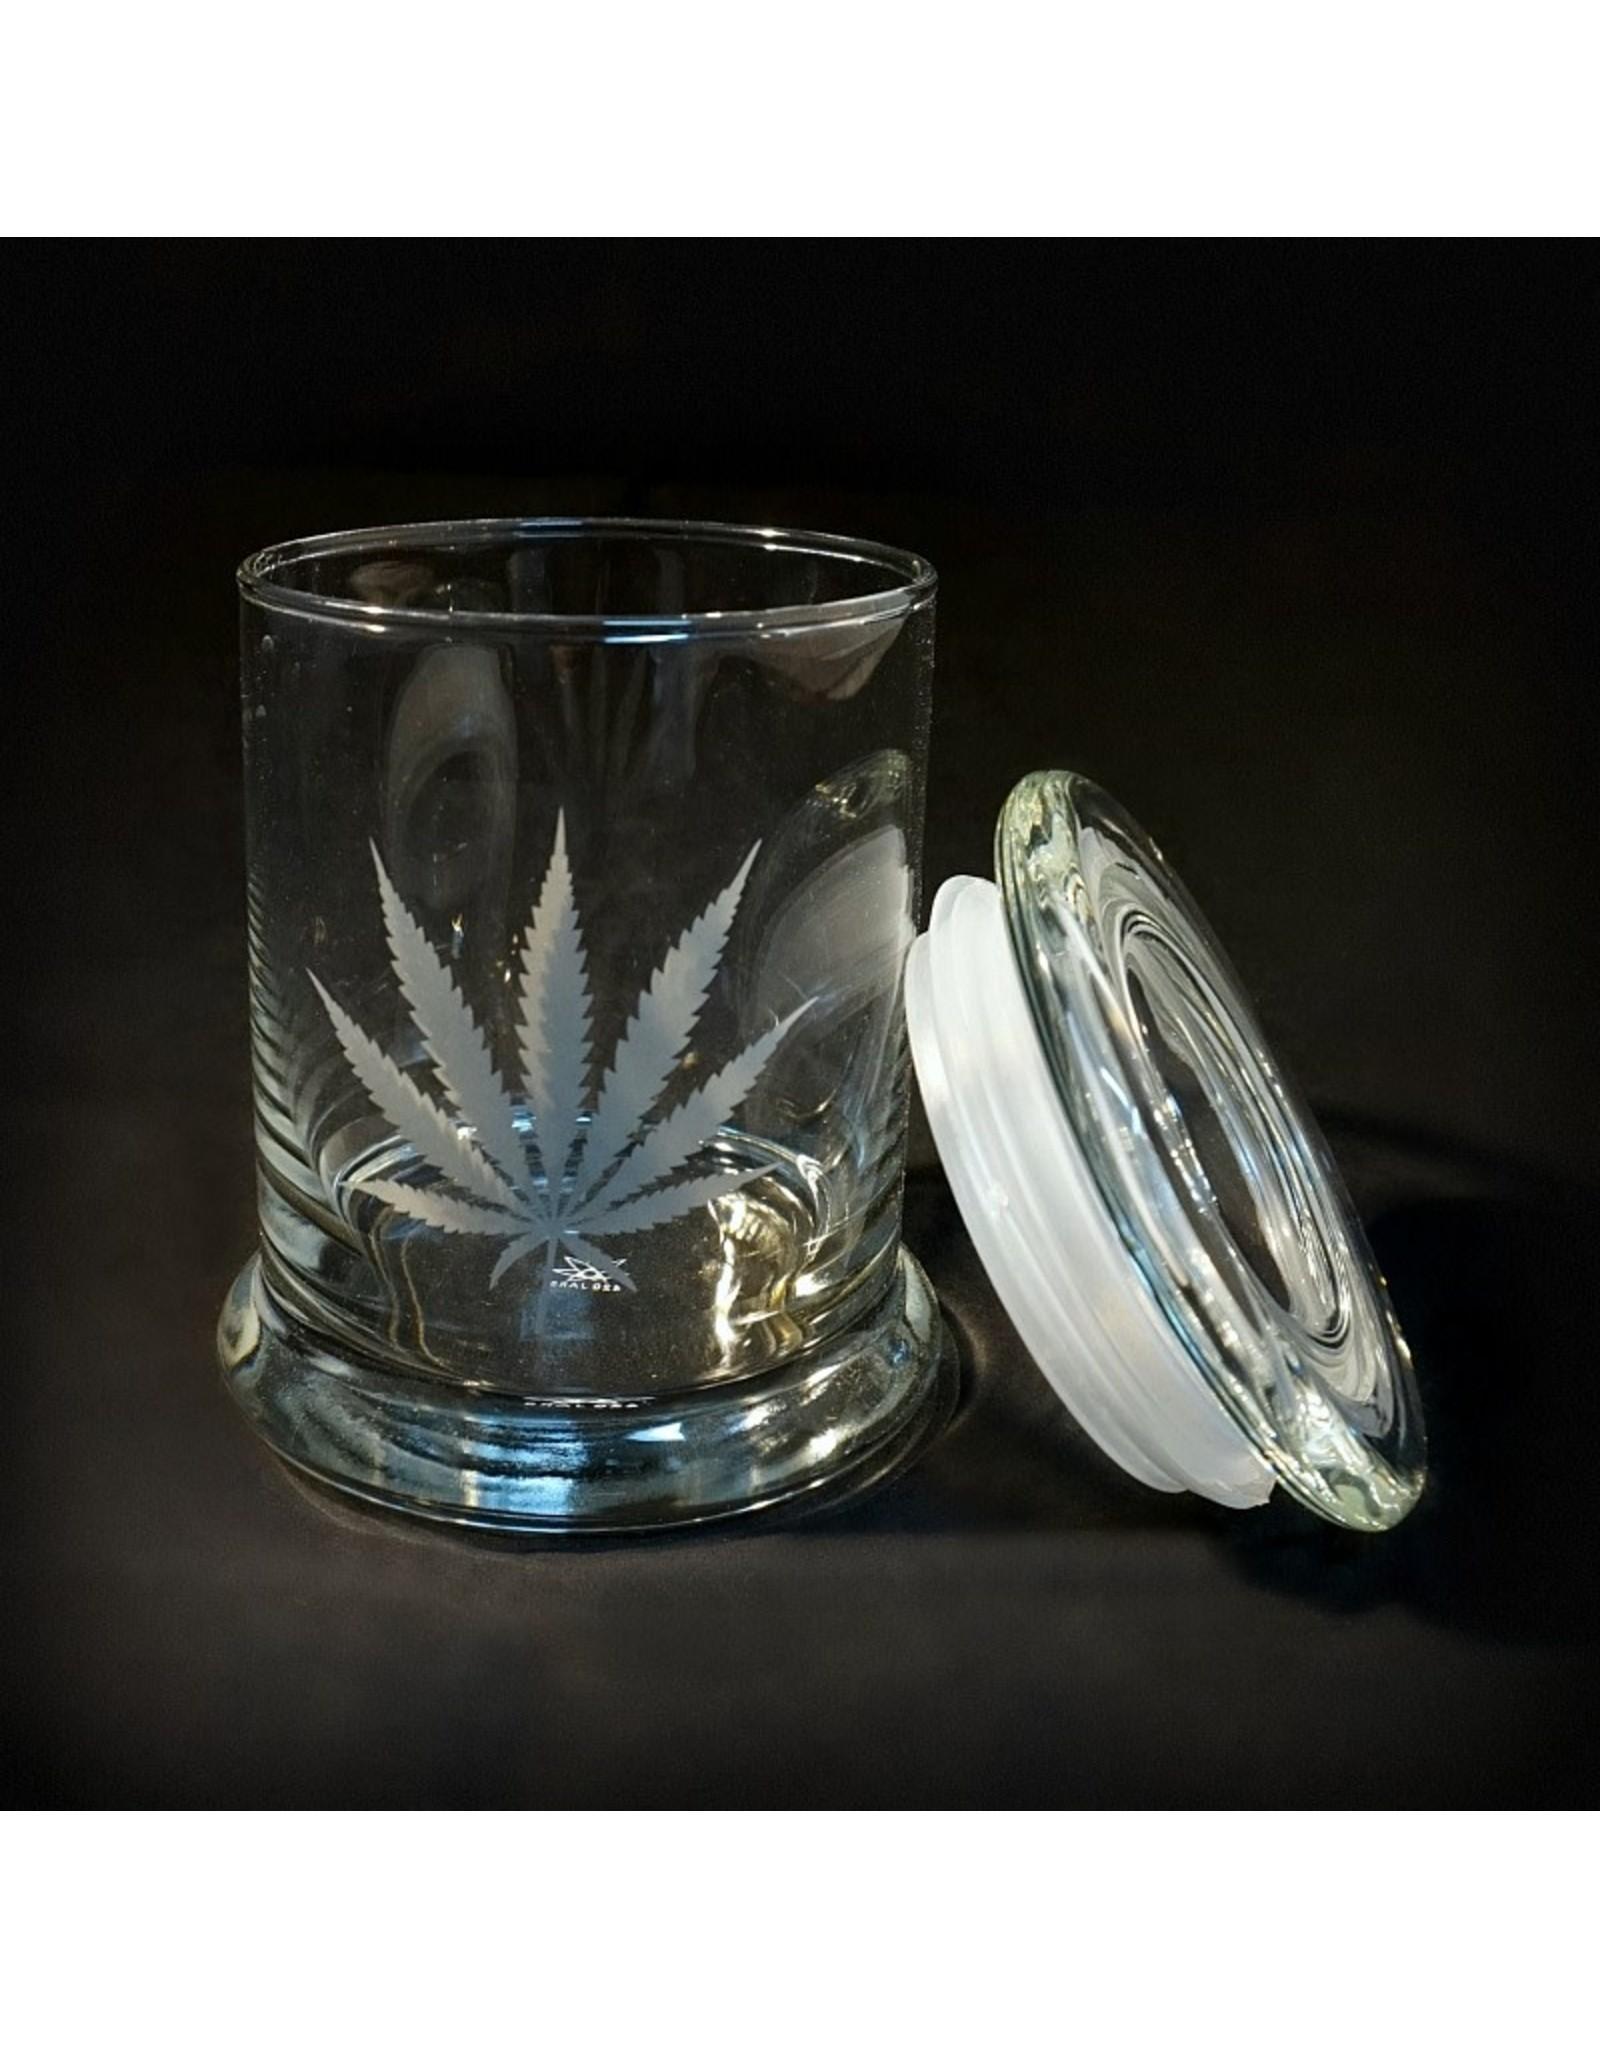 420 Science Jars